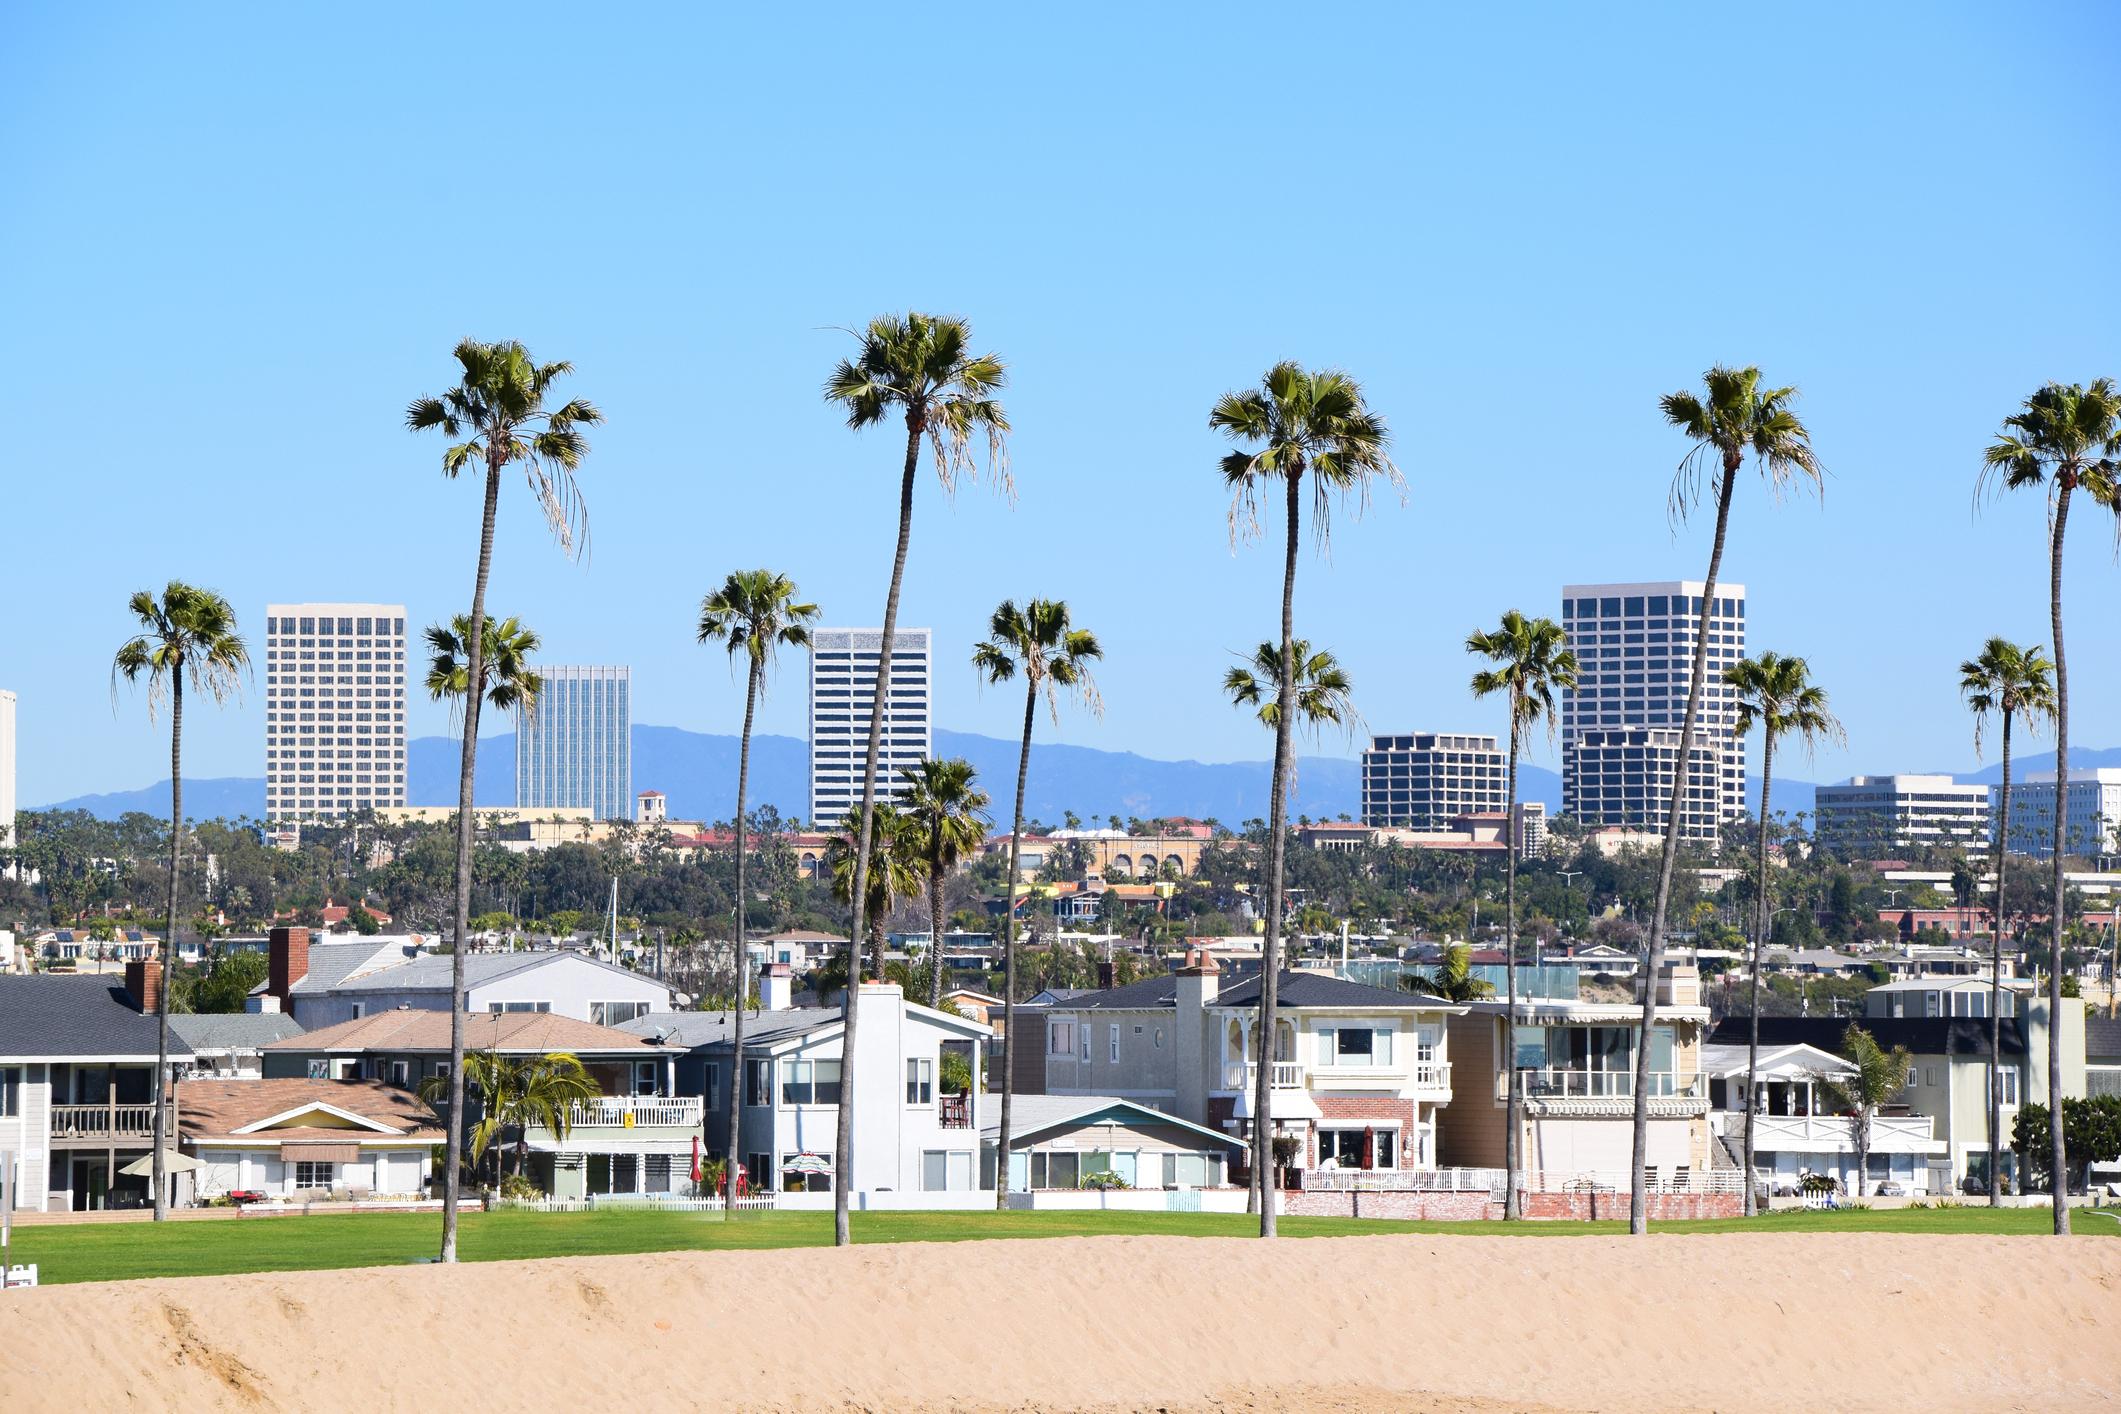 Orange County, California.